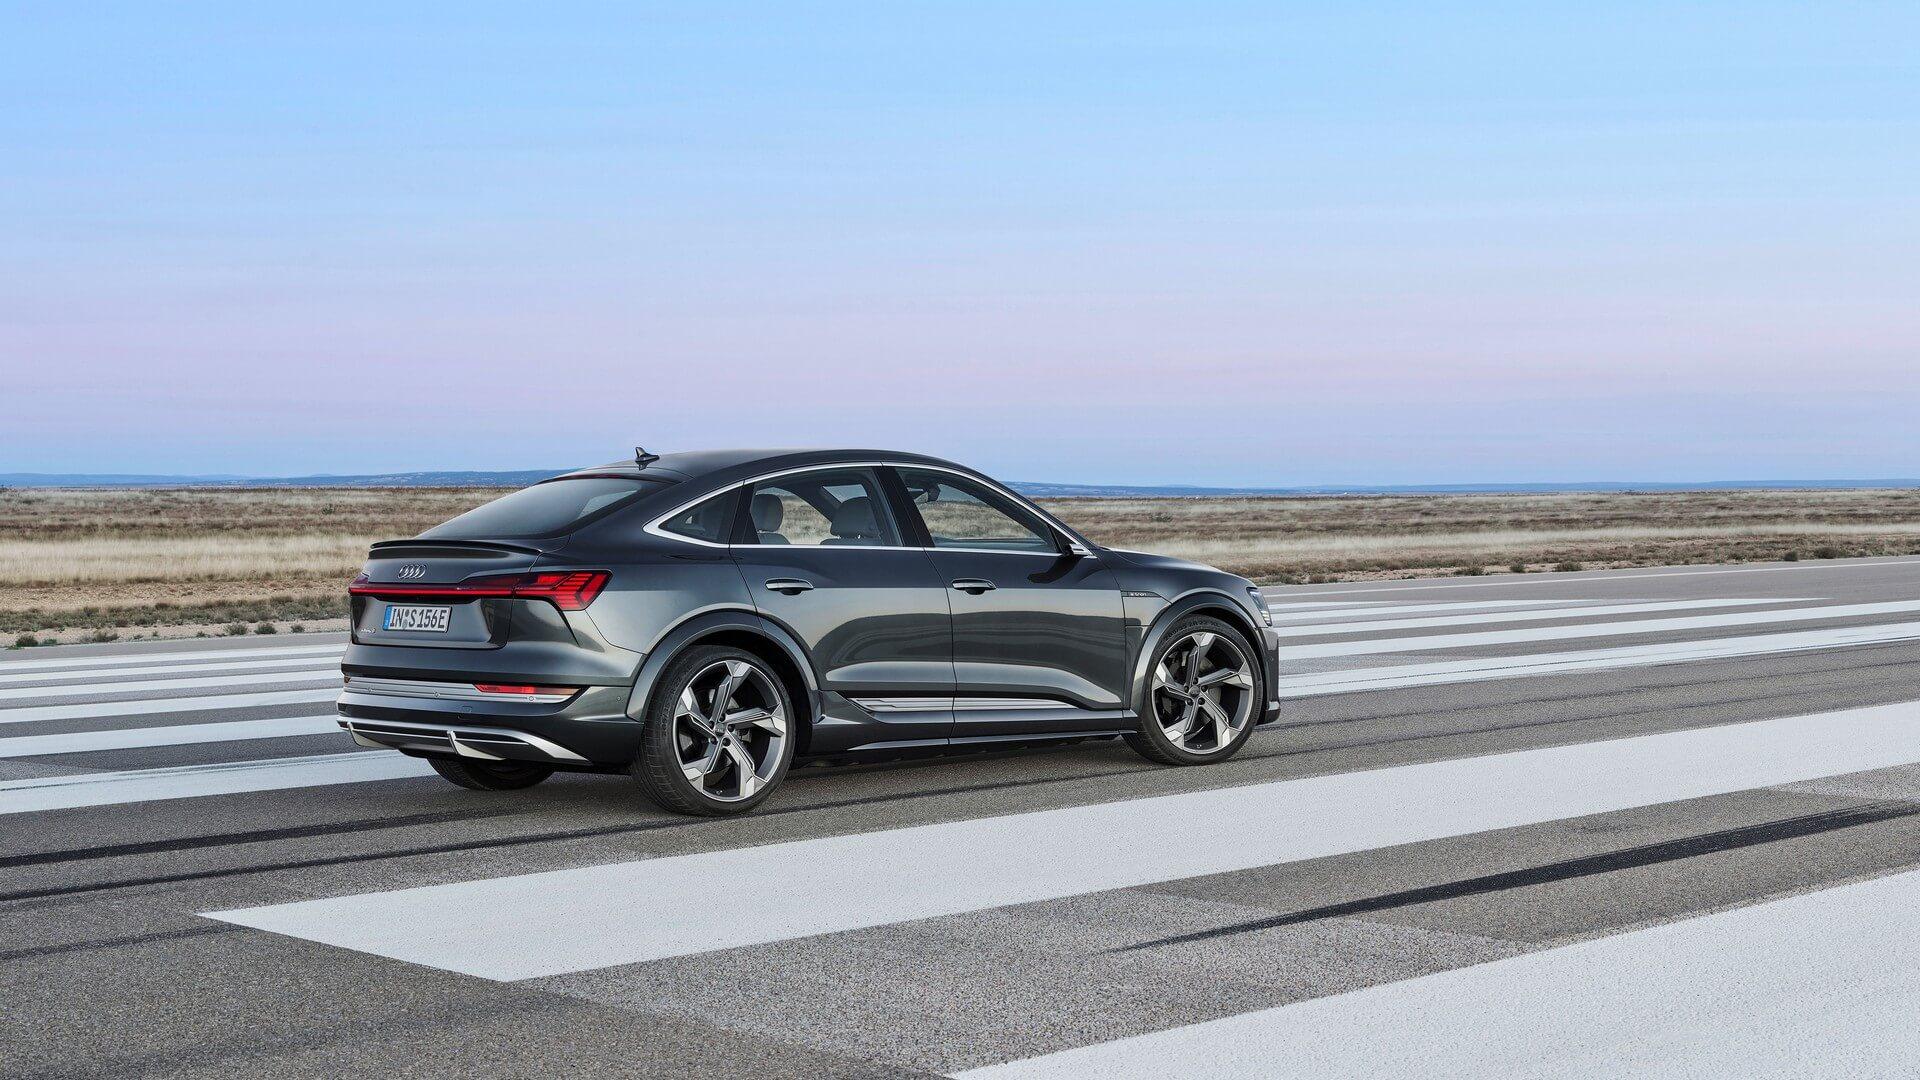 Audi-E-Tron-S-and-E-Tron-S-Sportback-2020-71